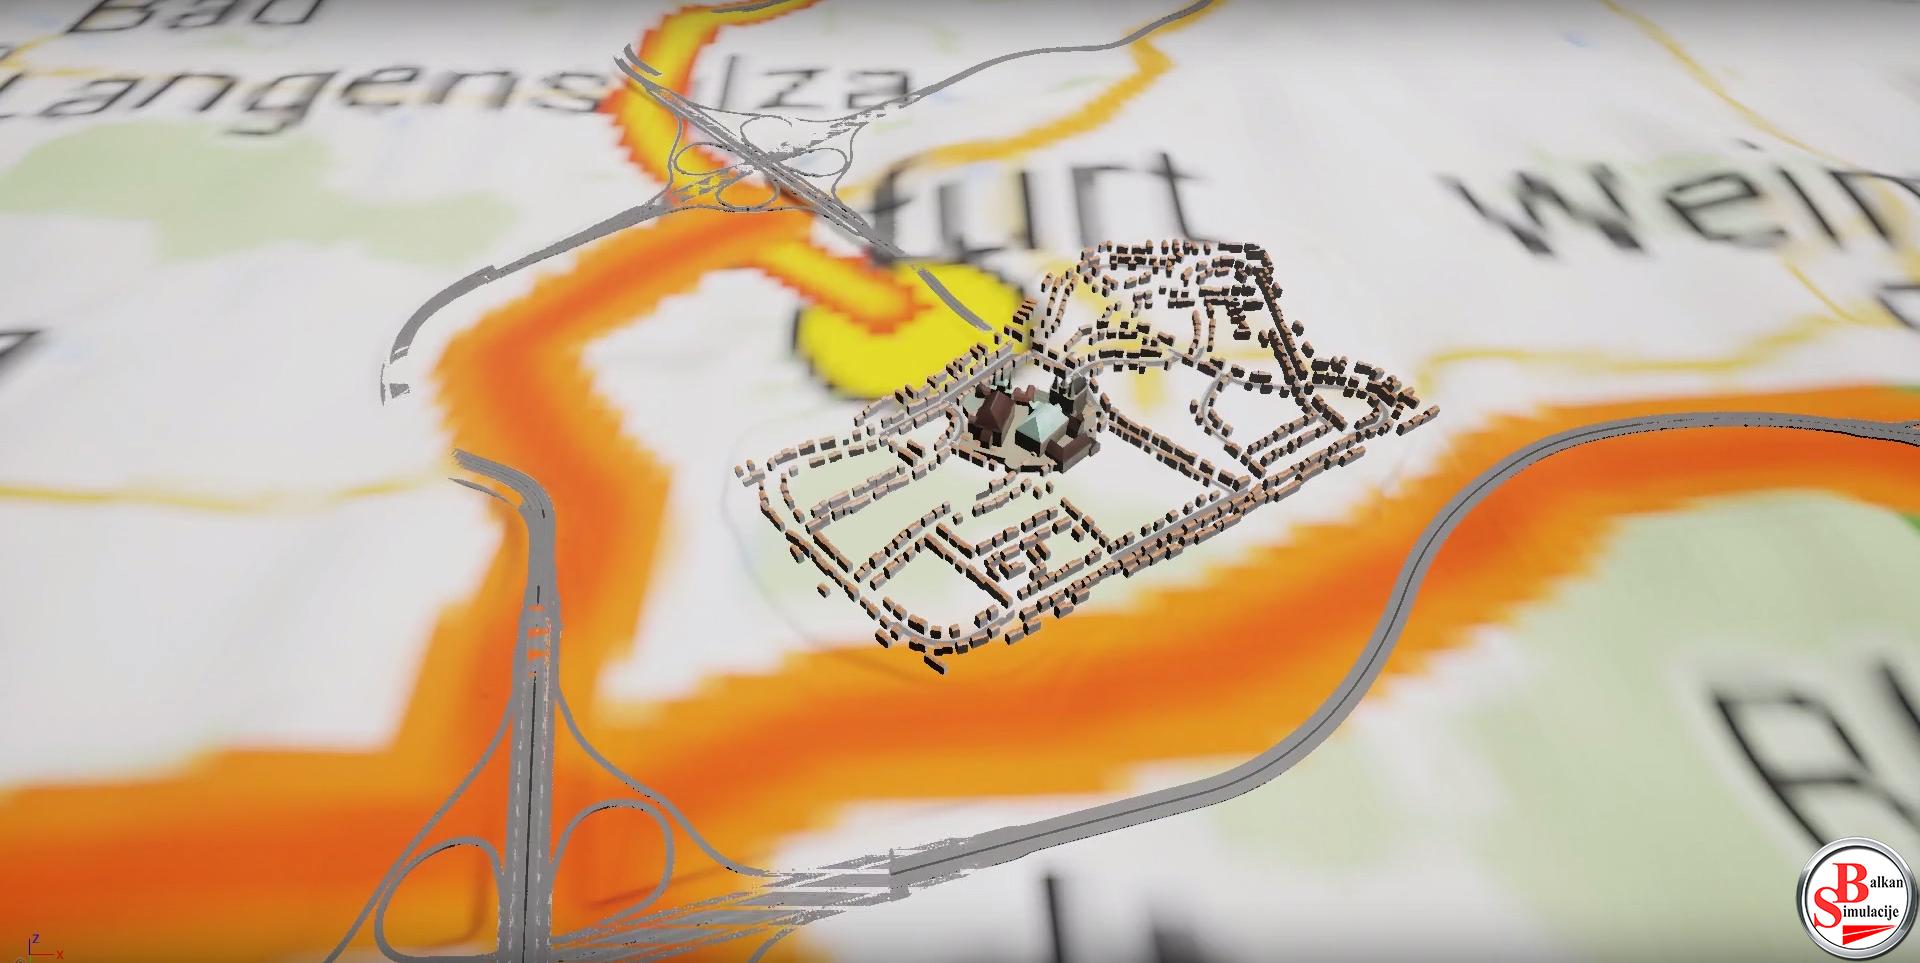 Balkan Simulacije Mapa Nemacke Fernbus Simulator